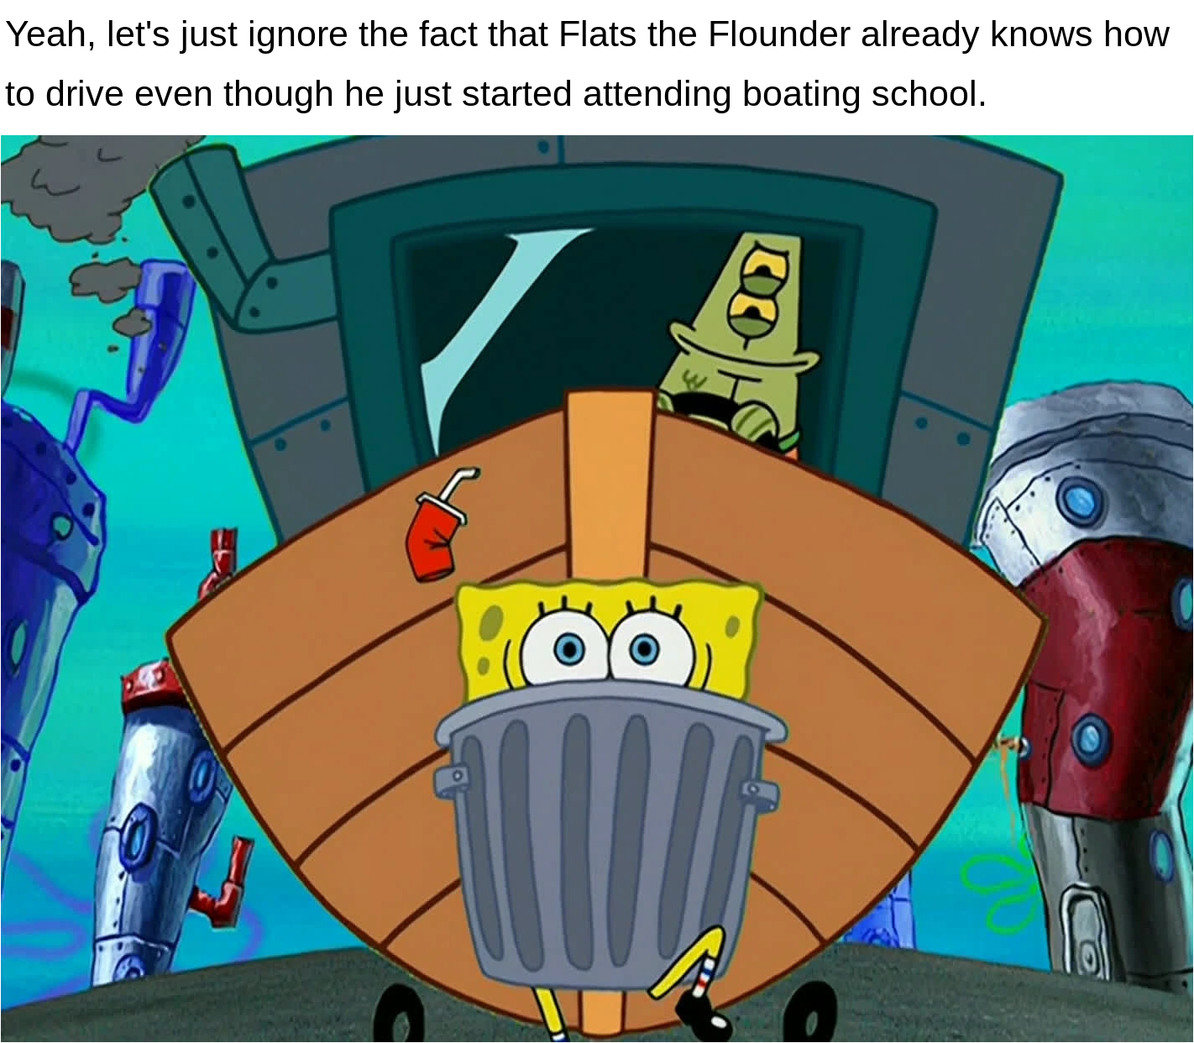 or the fact that SpongeBob's legs can go through metal - meme